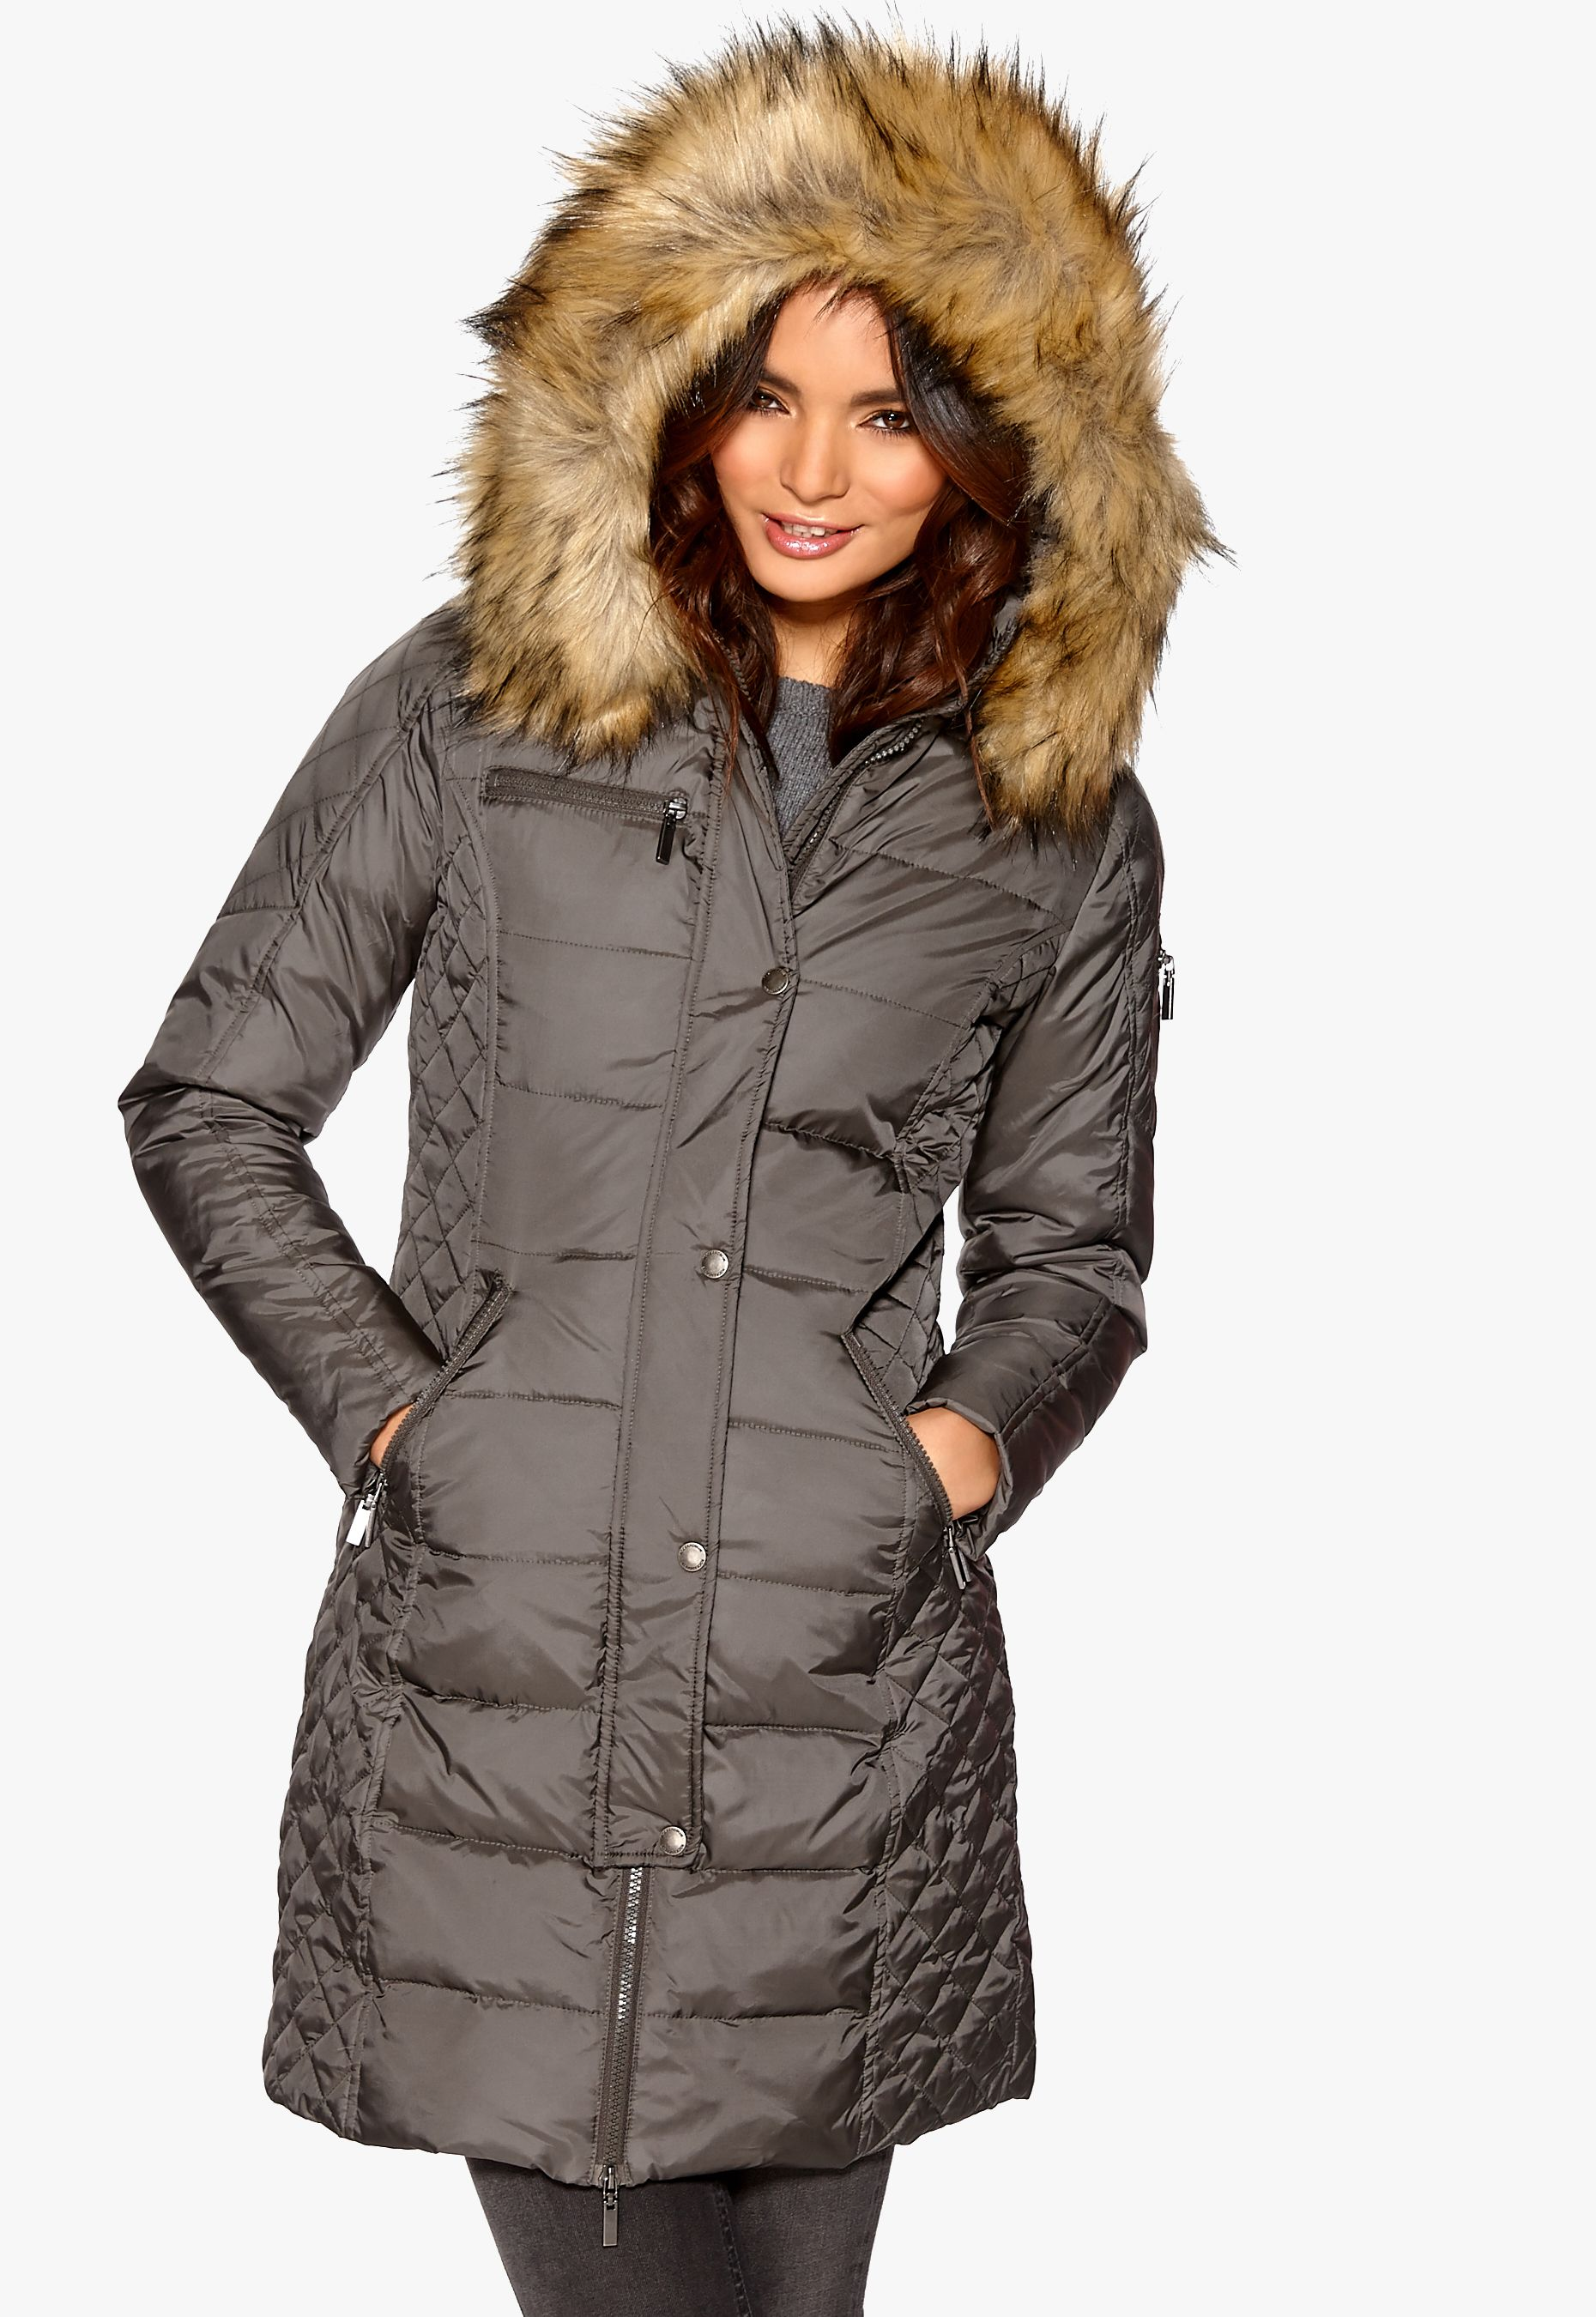 Rockandblue Jacket Winter Is Pinterest Coming Beam Jackets 8R8wS